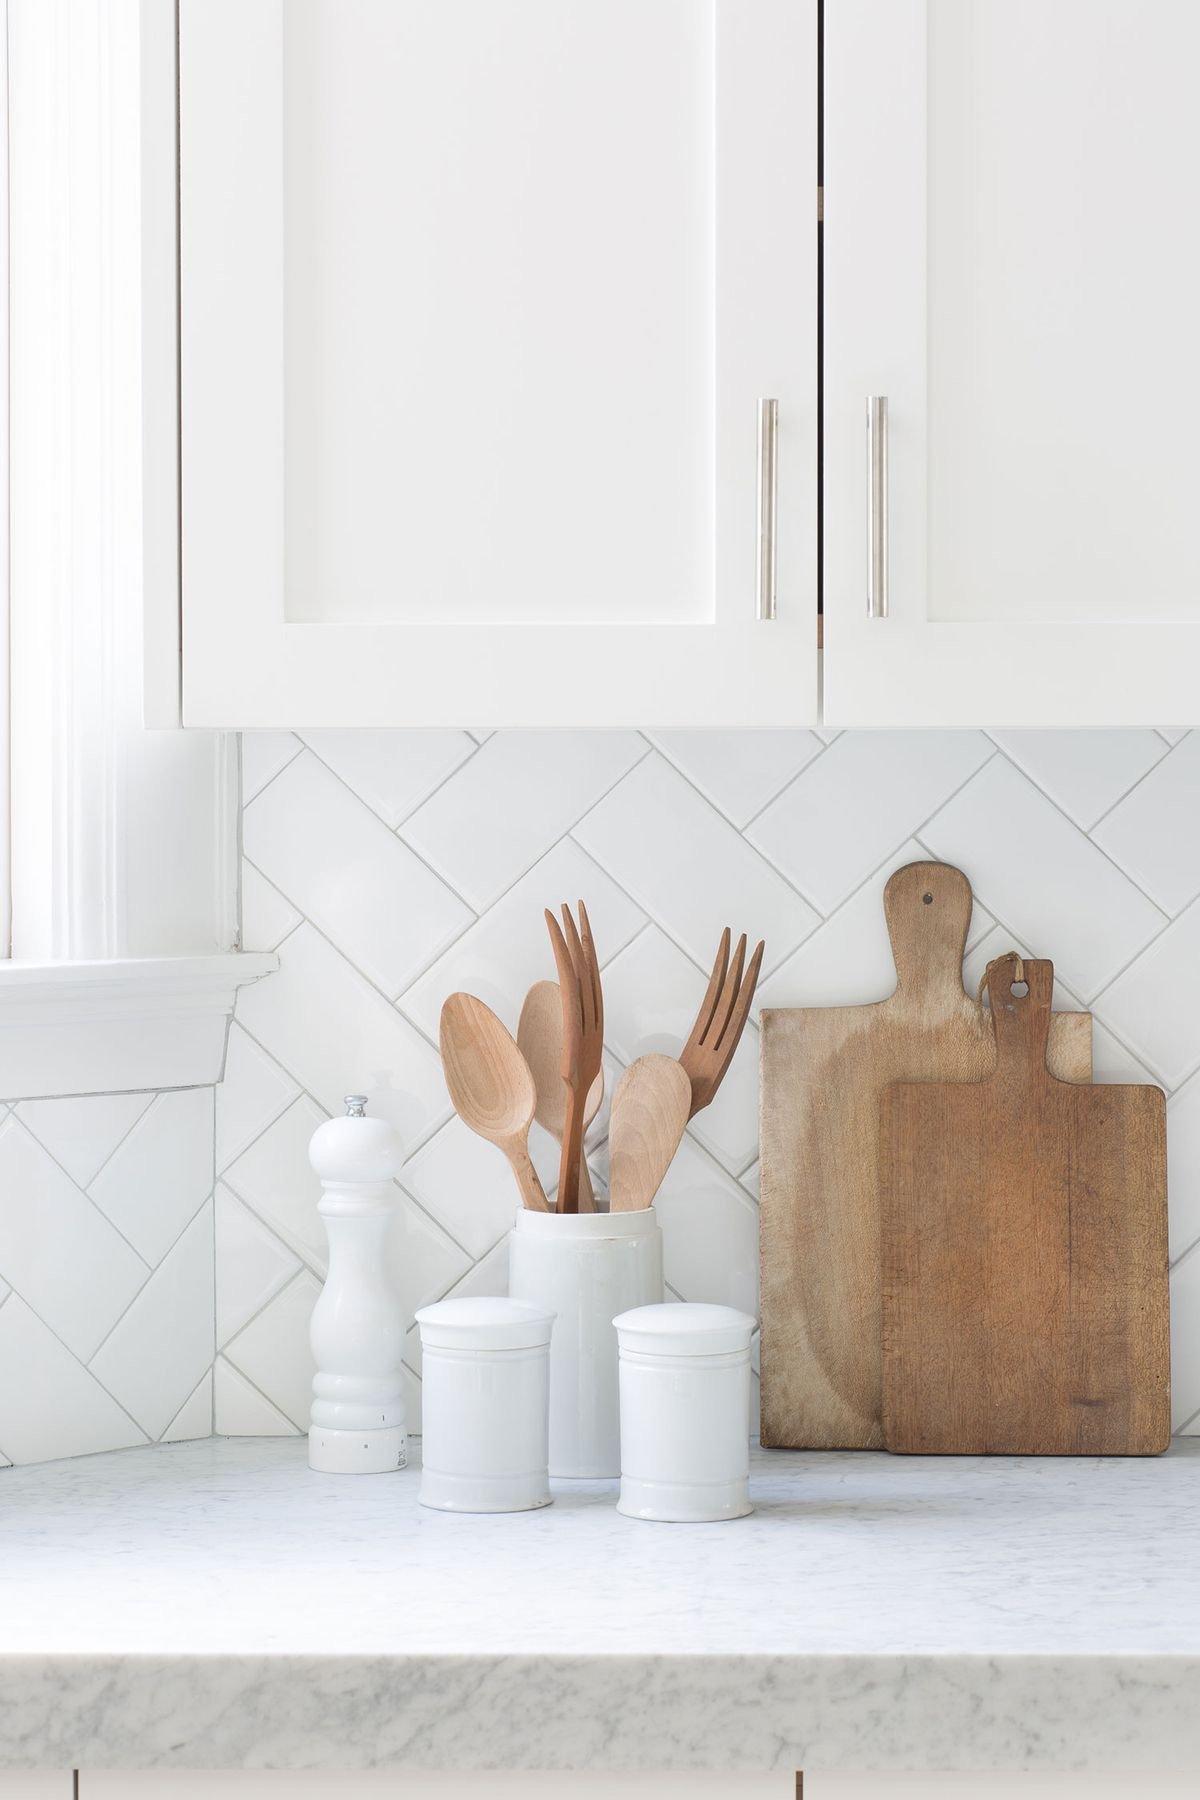 White Herringbone Subway Tile Kitchen Backsplash Sneak Peek Design,Navy Blue And White Bedroom Decorating Ideas